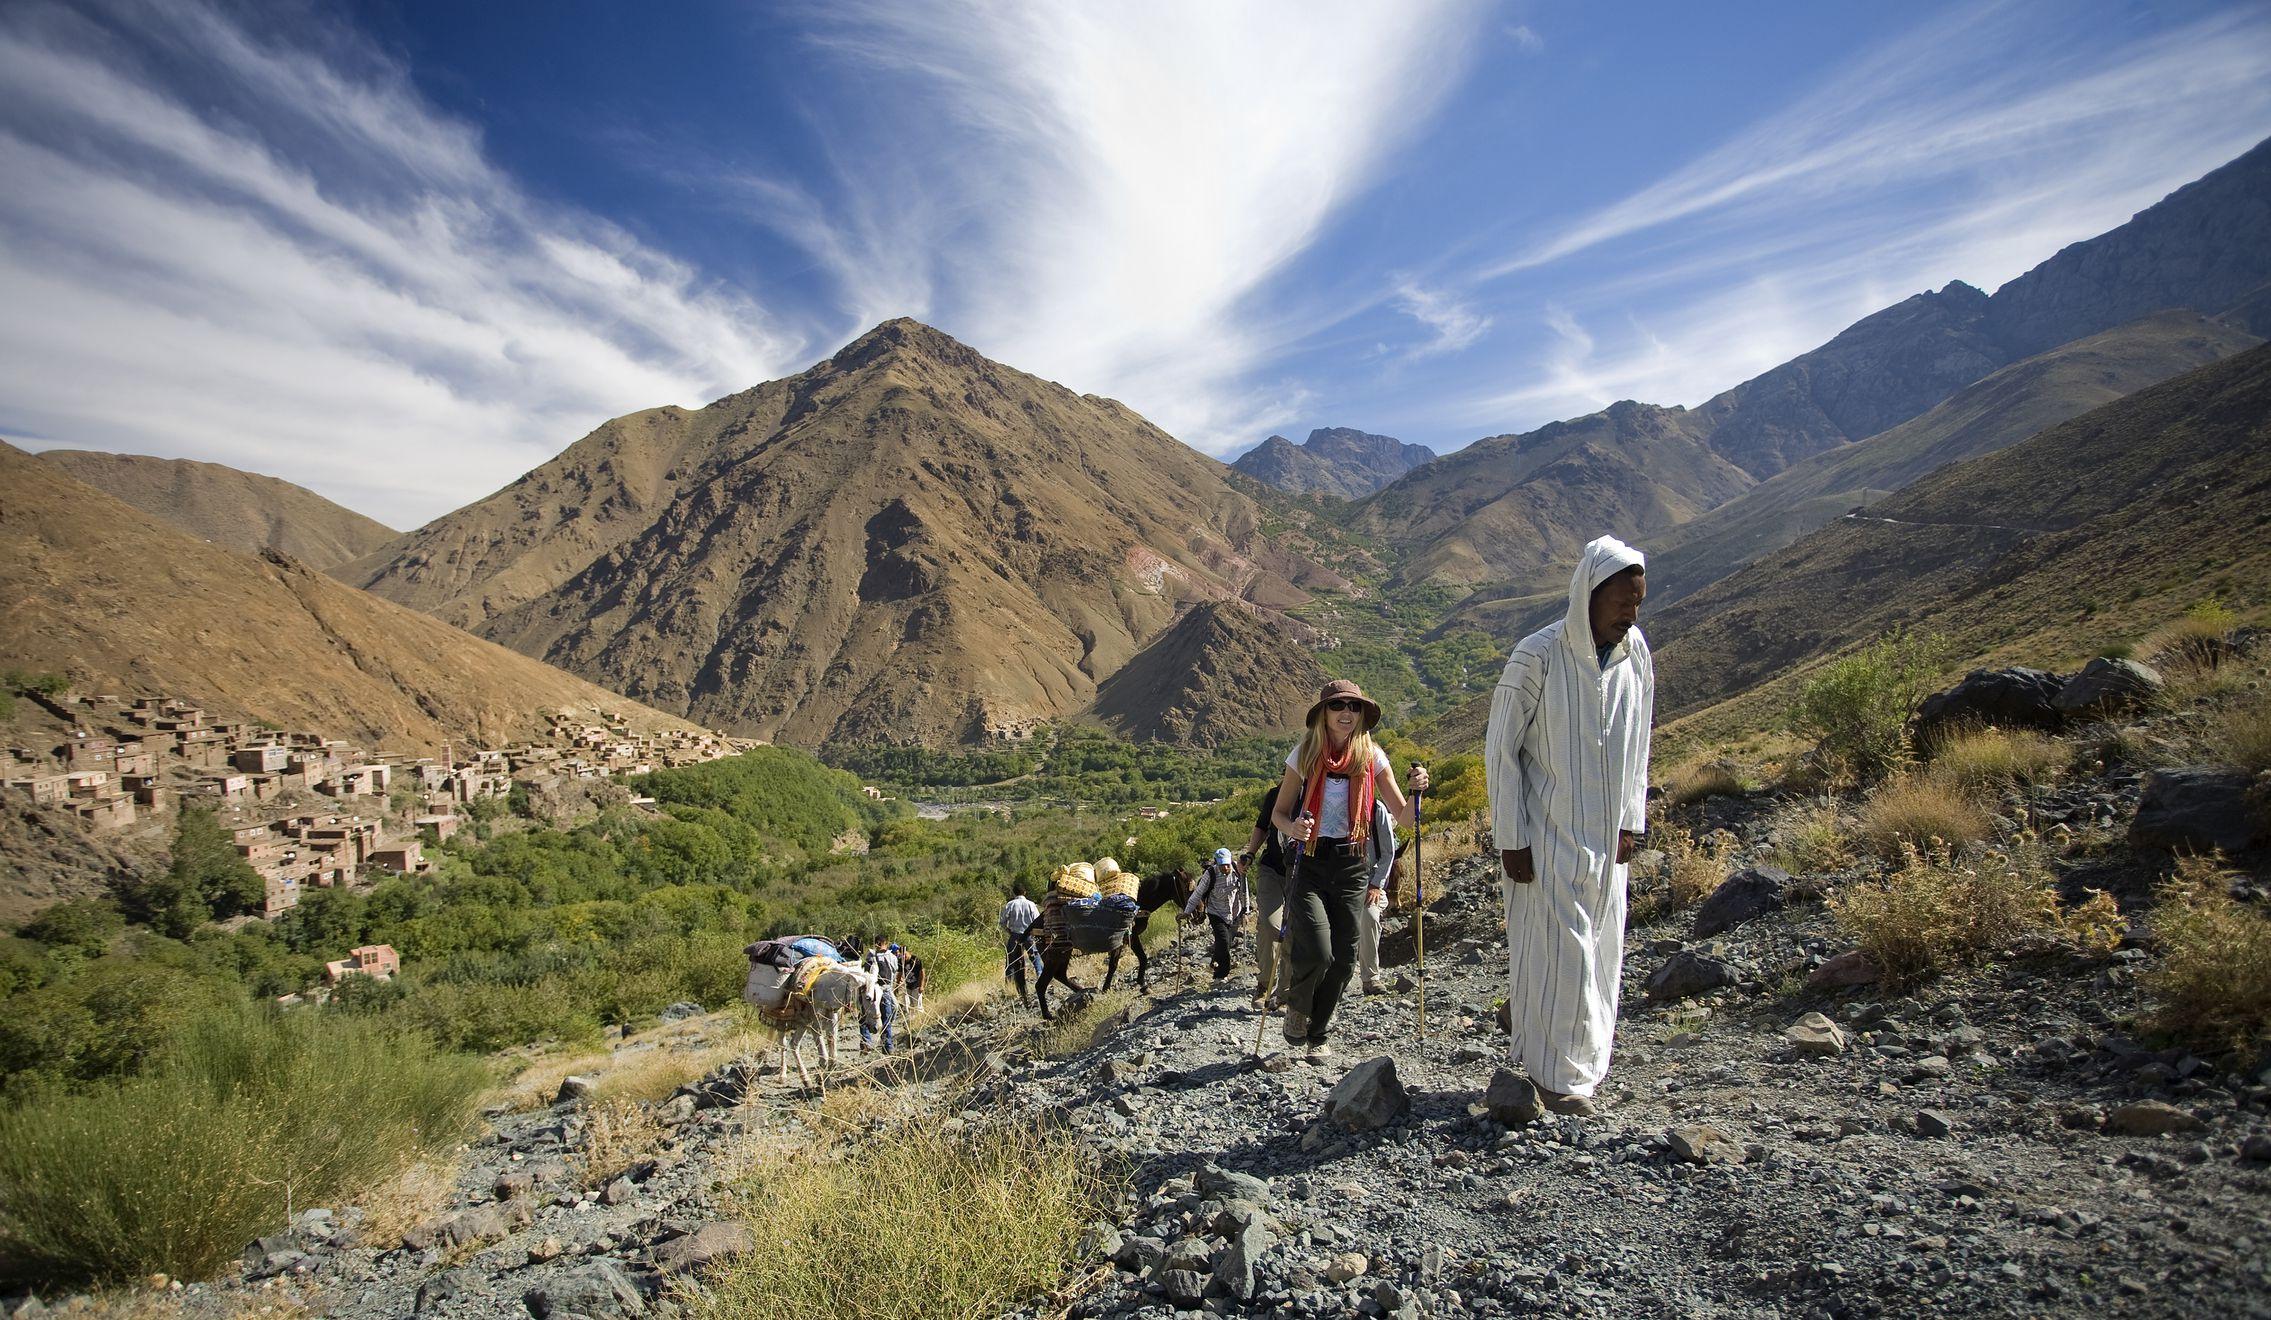 A guide leads trek through the Atlas Mountains.